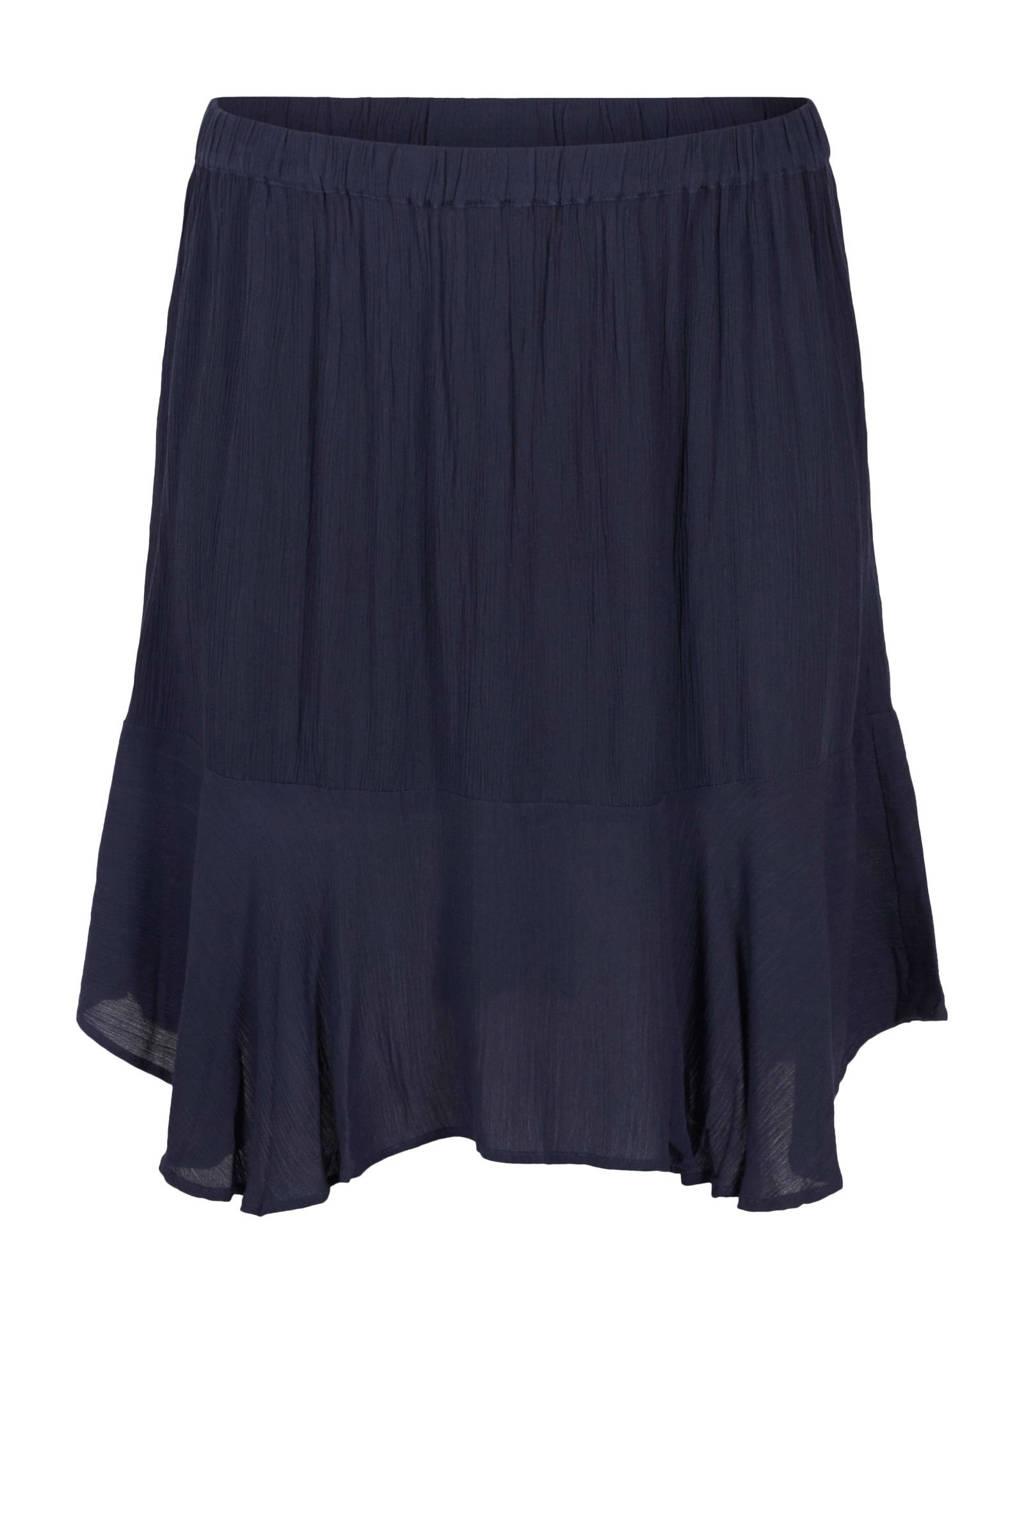 Zizzi rok donkerblauw, Donkerblauw